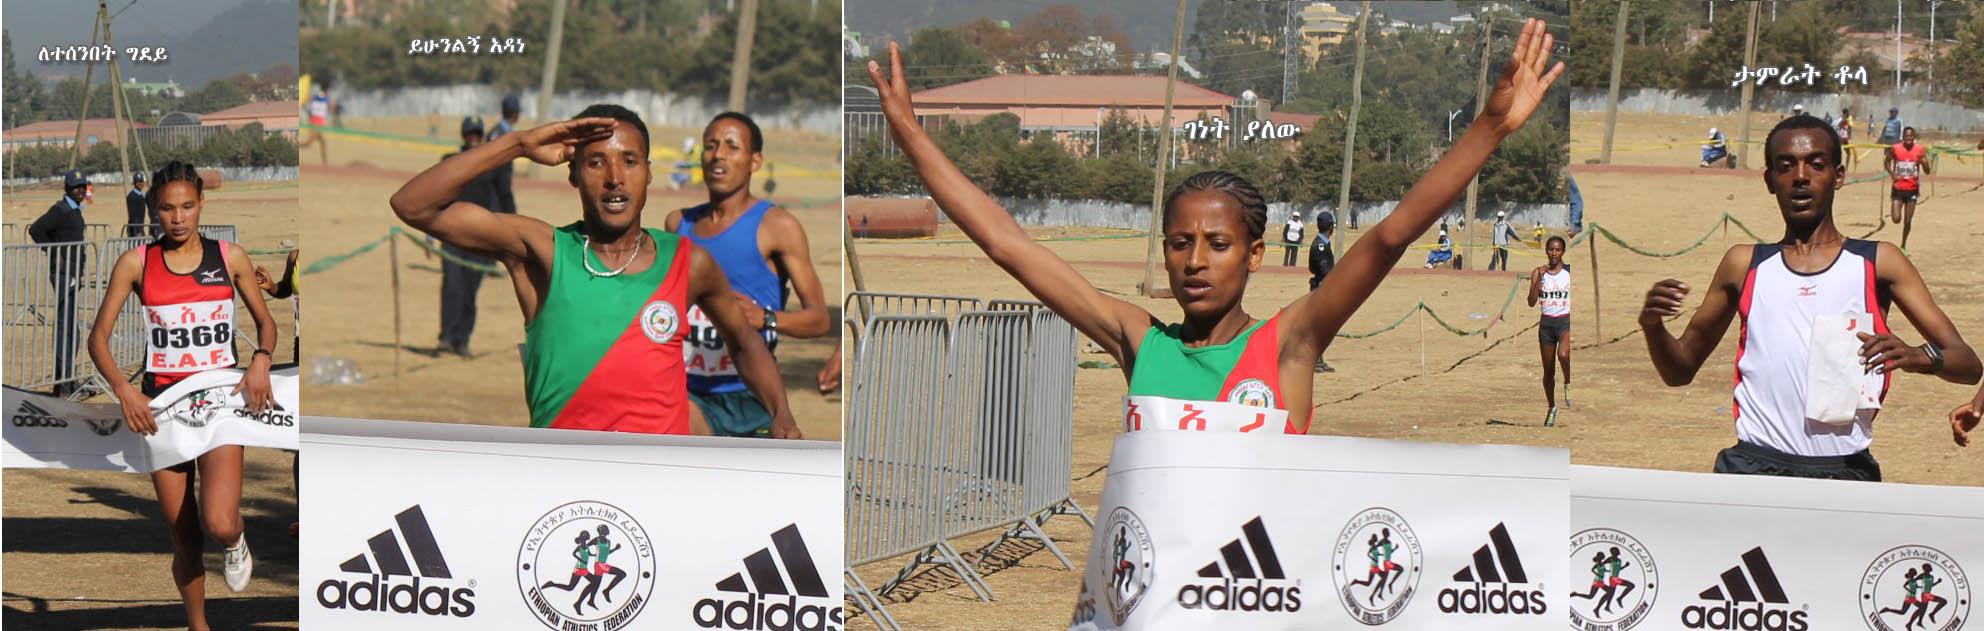 Winners of the 32nd Janmeda cross-country race